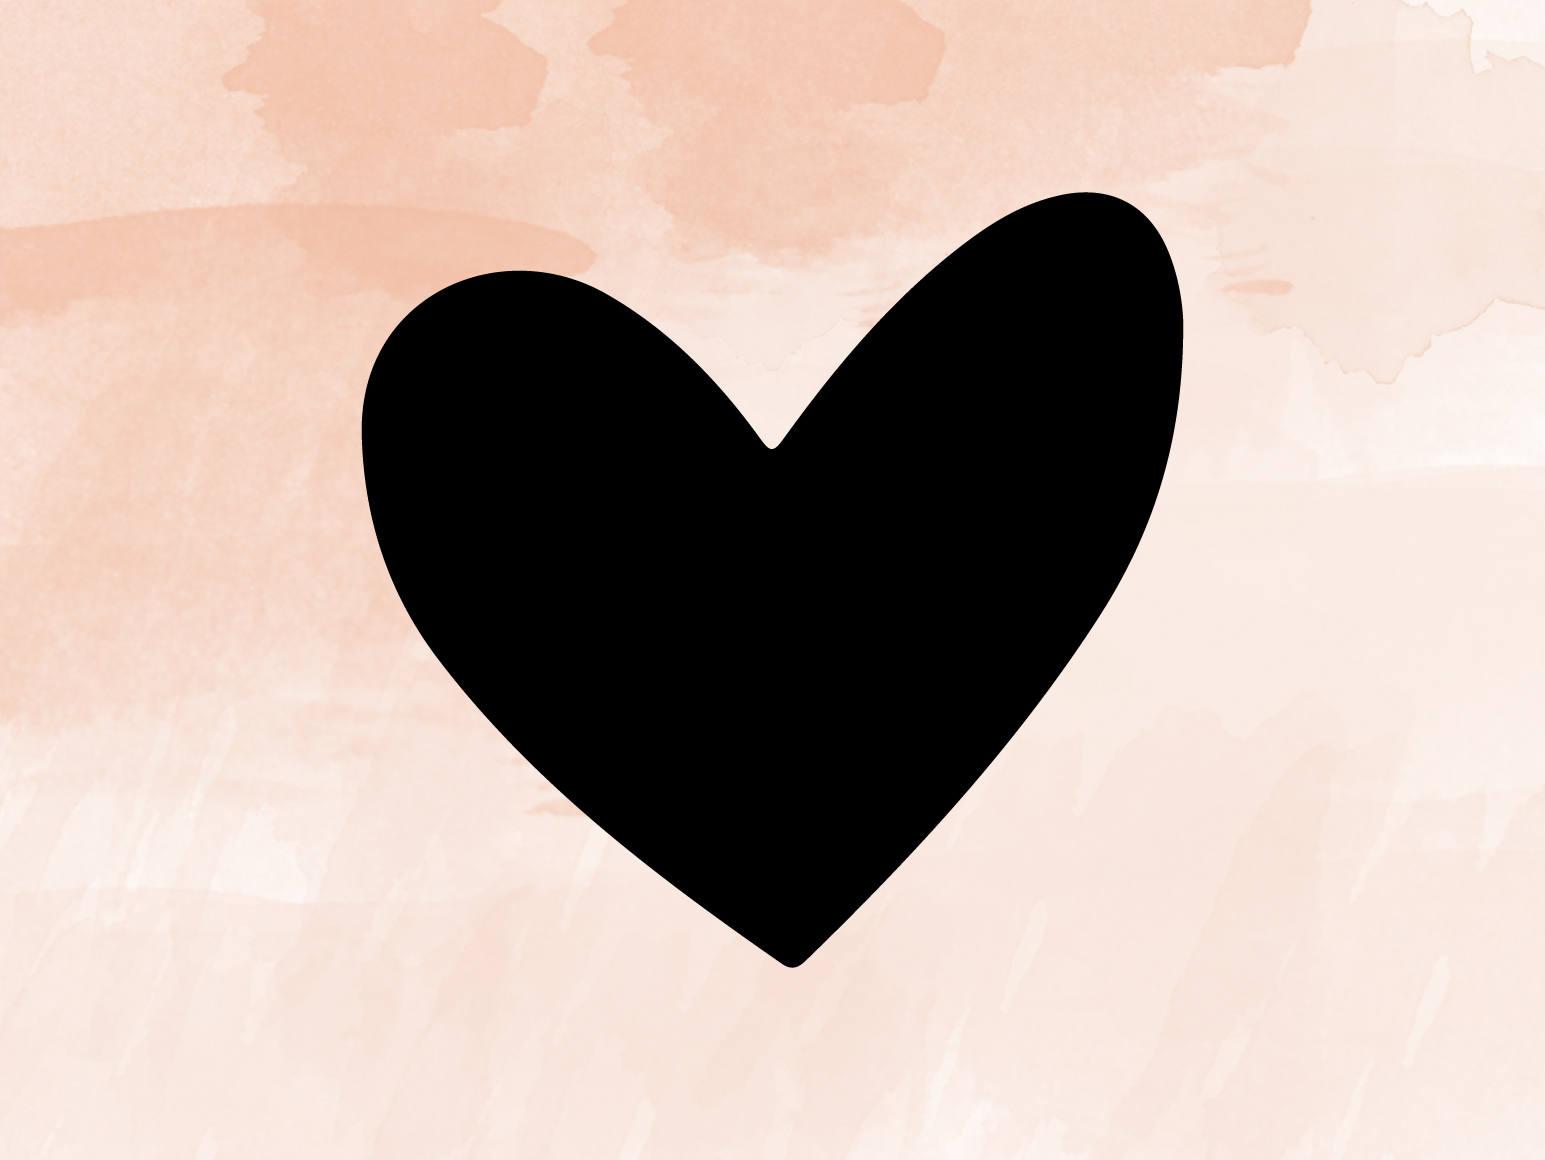 Download Heart SVG File Heart Cut File Heart Cricut Love Svg File